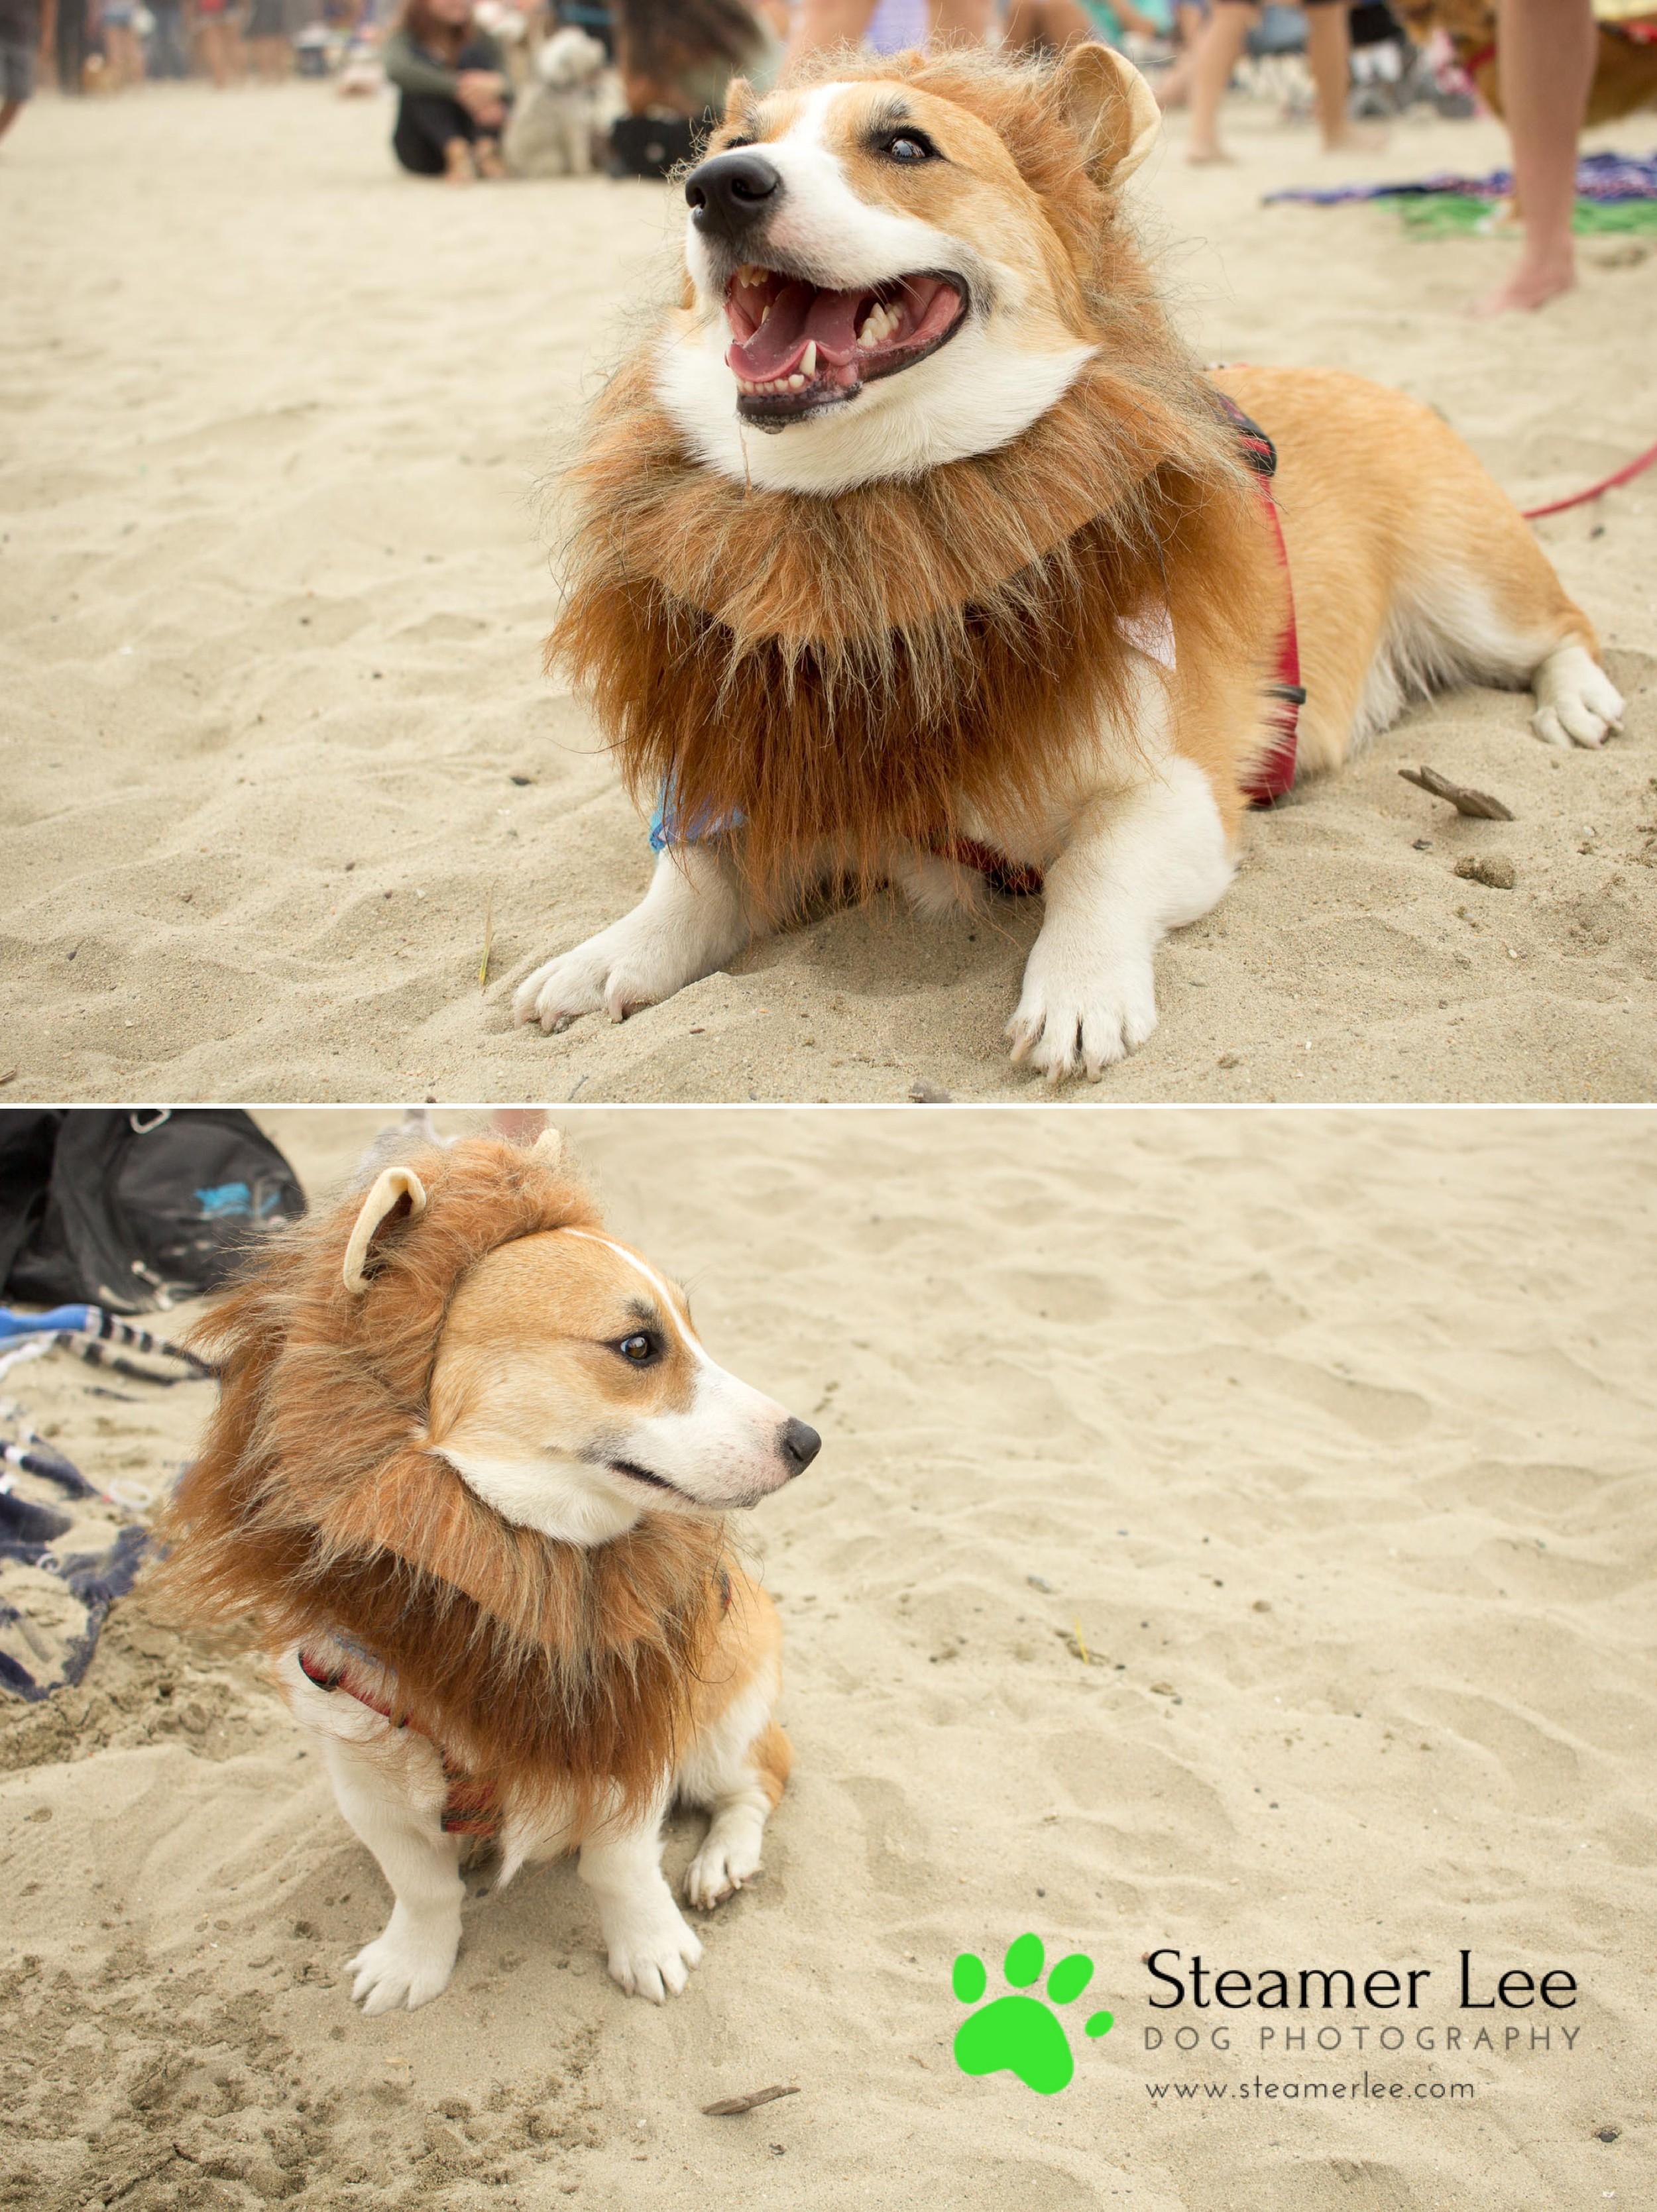 Steamer Lee Dog Photography - July 2017 So Cal Corgi Beach Day - Vol.2 - 17.jpg